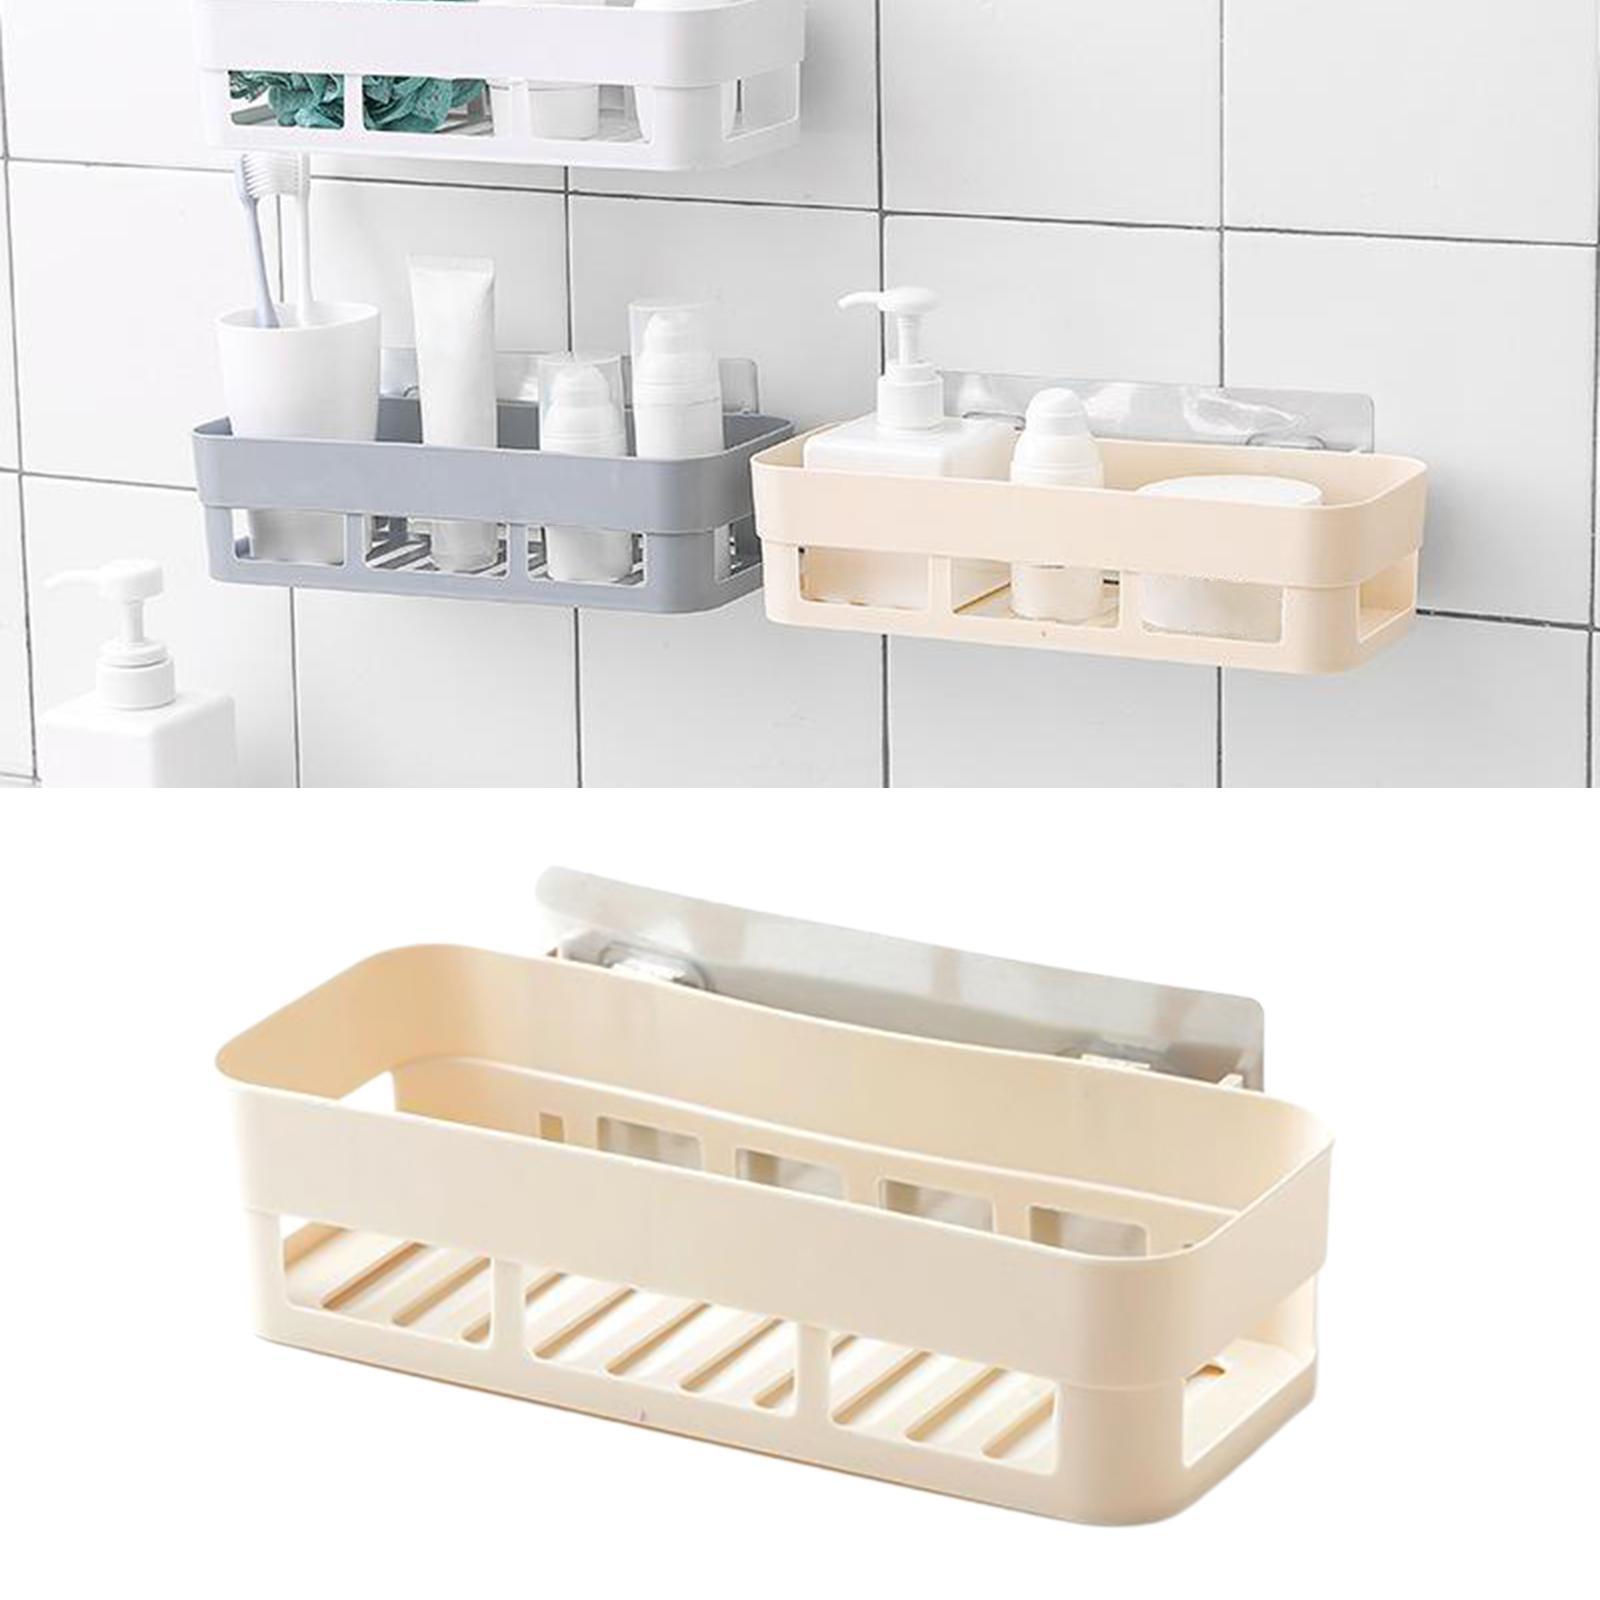 thumbnail 5 - Self-Adhesive-Shower-Shelf-Plastic-Shower-Caddy-Organiser-Bathroom-Shelf